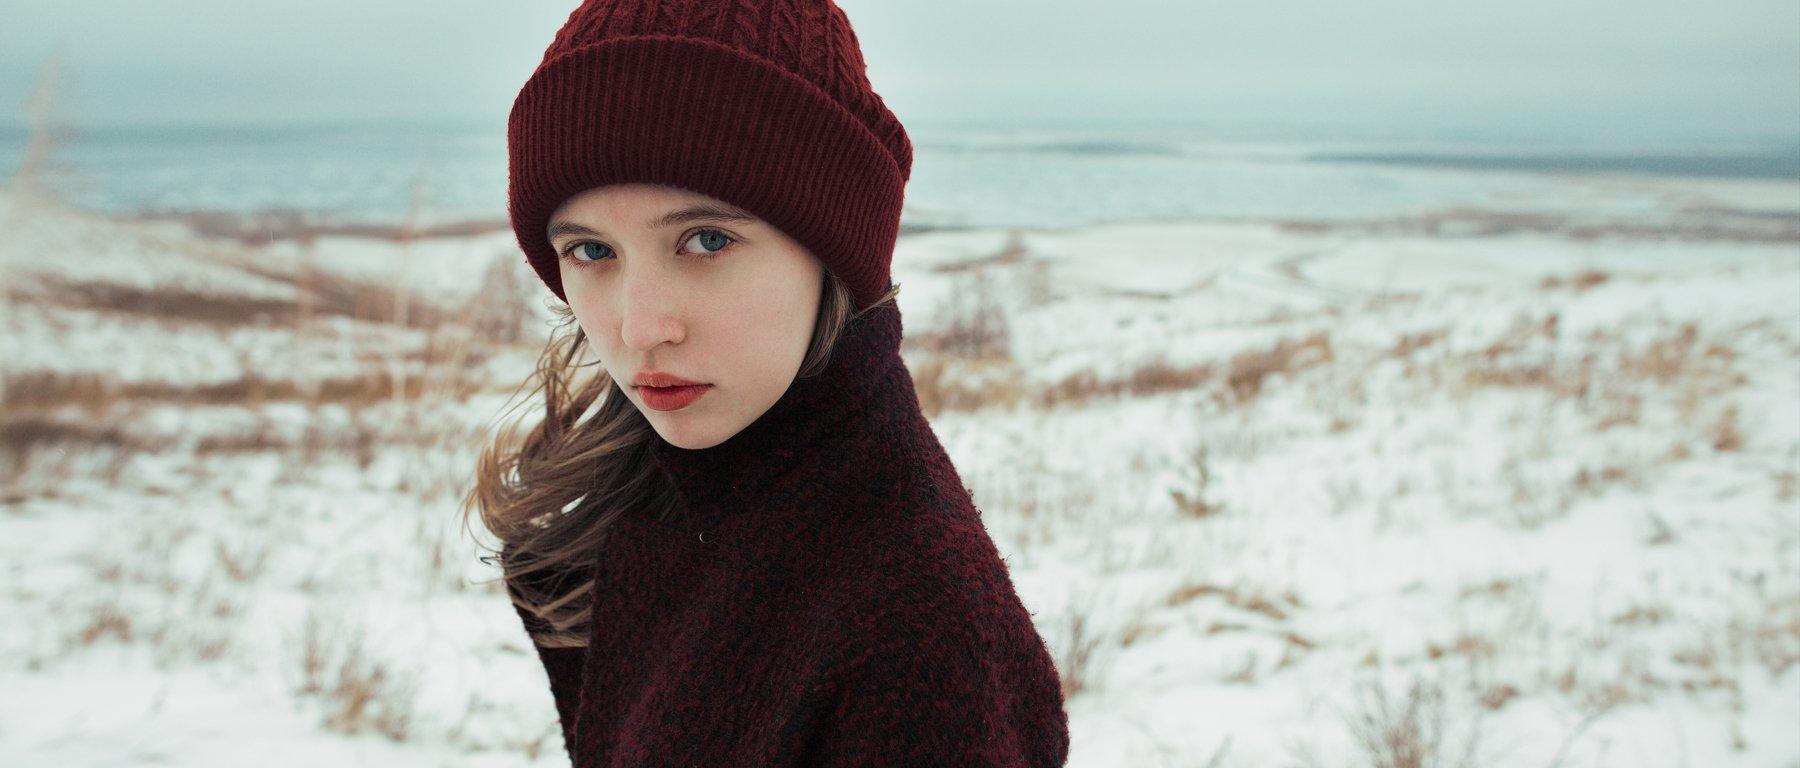 girl, nature, autumn, fall, snow, november, russia, Роман Филиппов